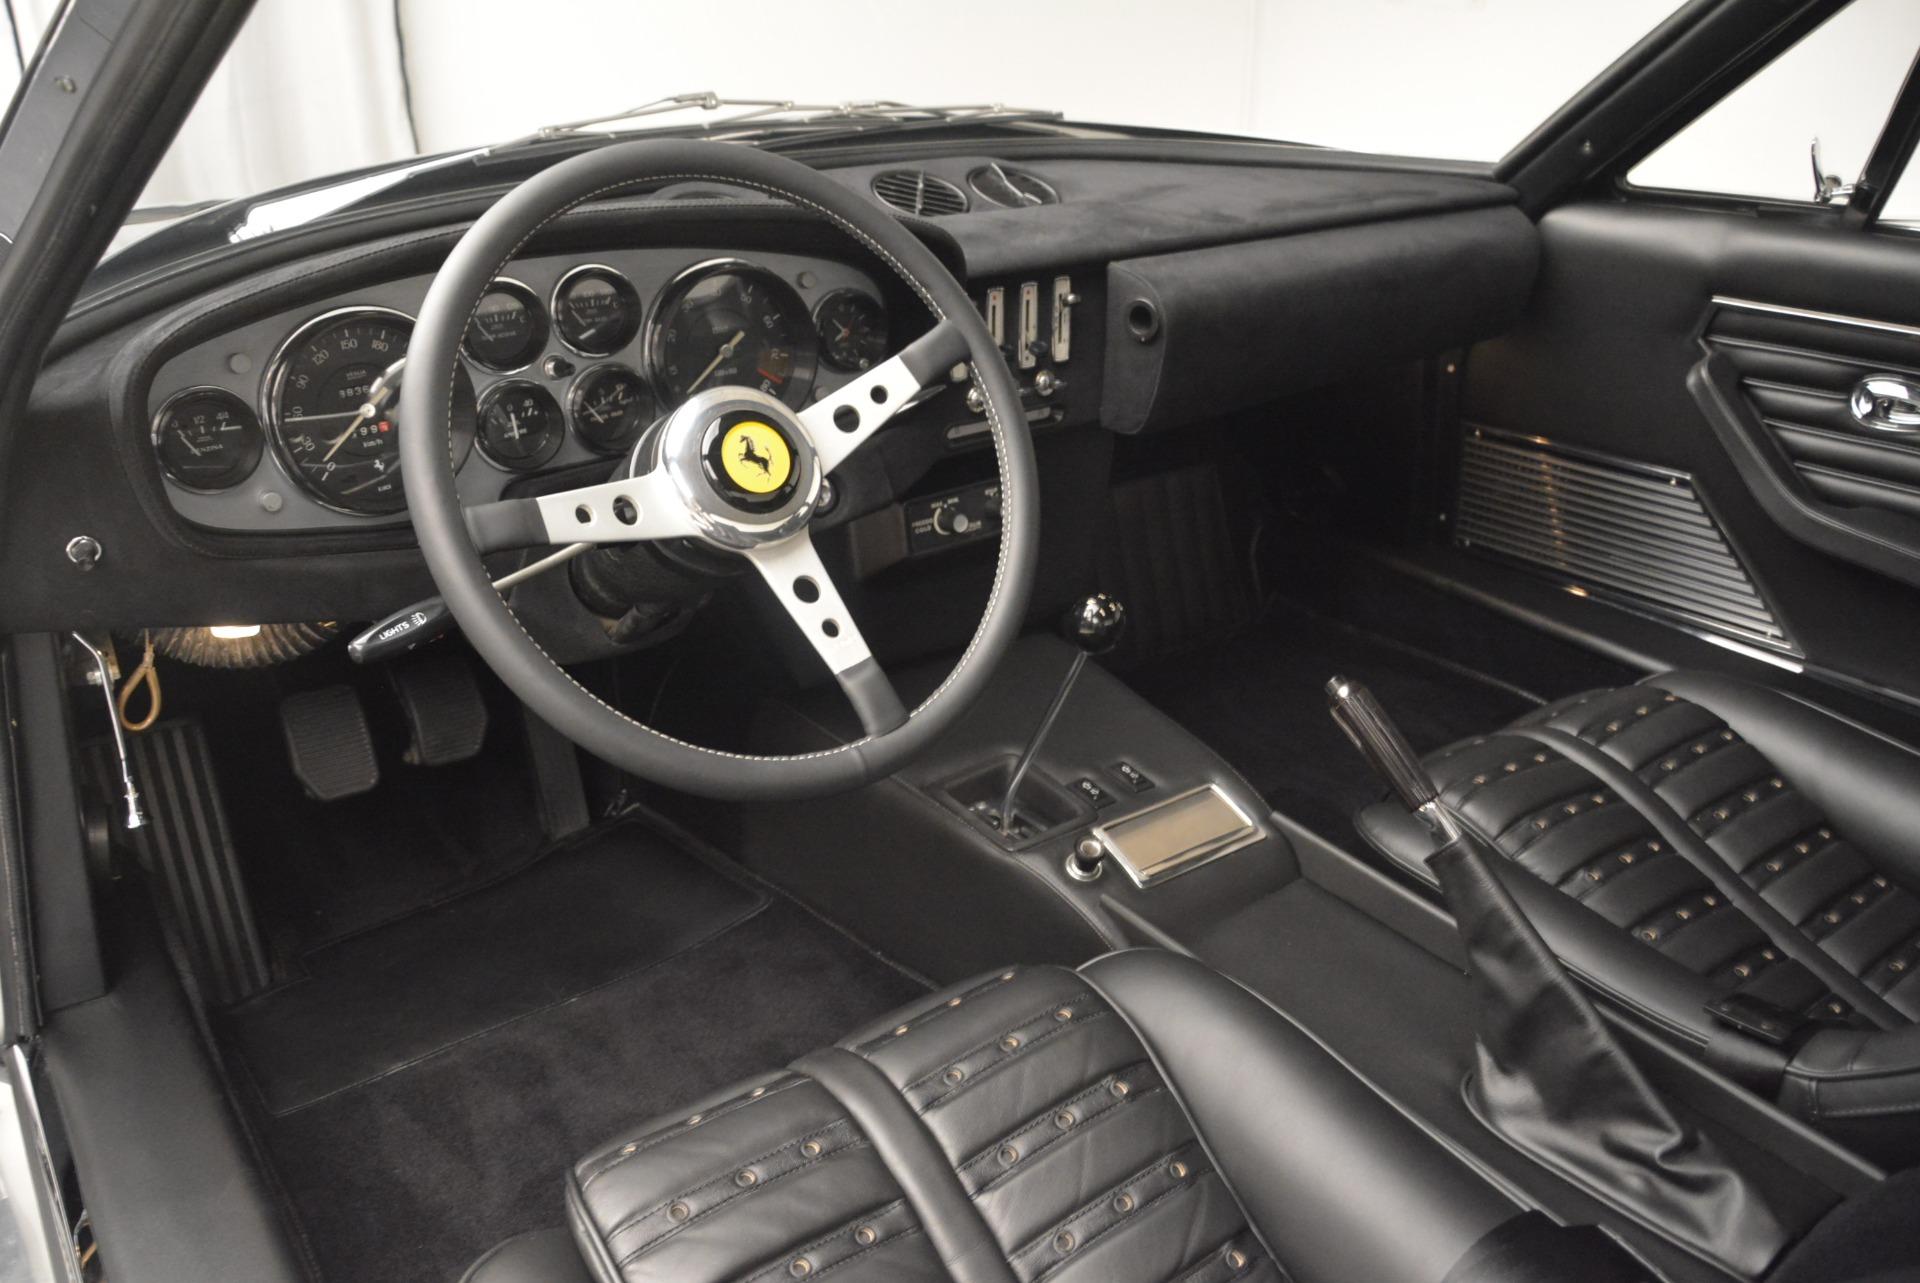 Used 1971 Ferrari 365 GTB4 Daytona